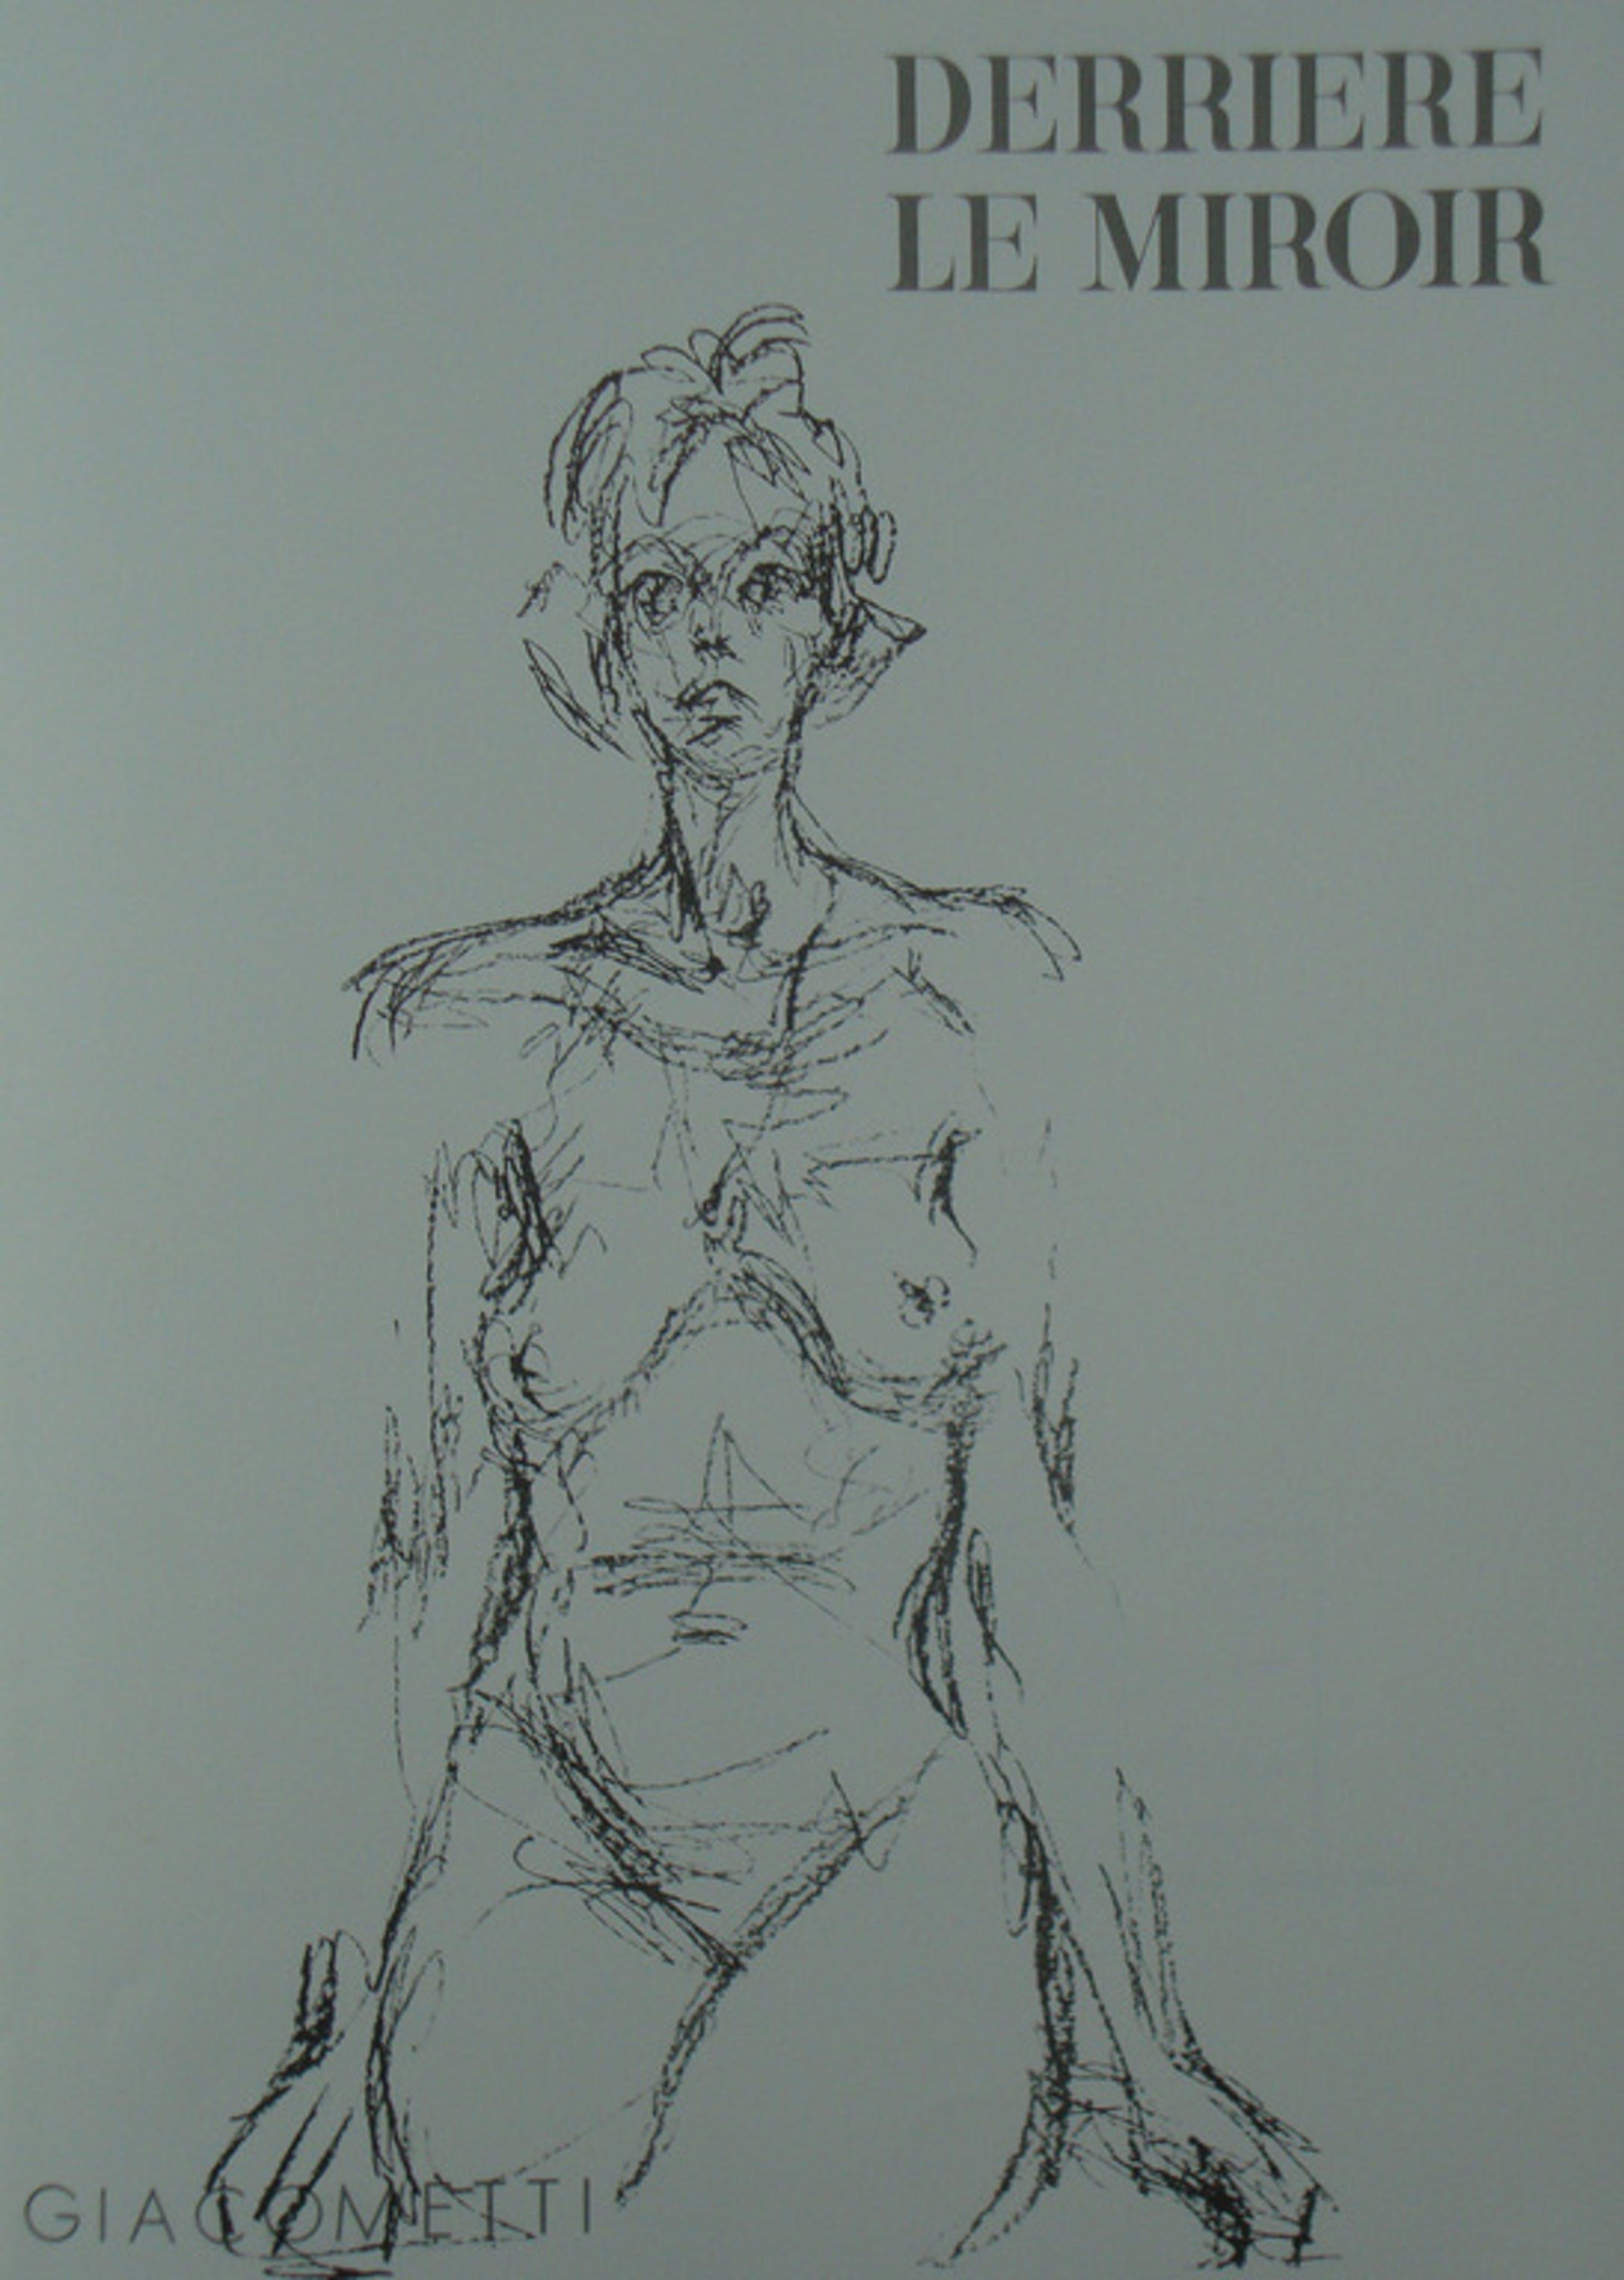 Giacometti, originele litho: cover van de DLM 127 kopen? Bied vanaf 1!